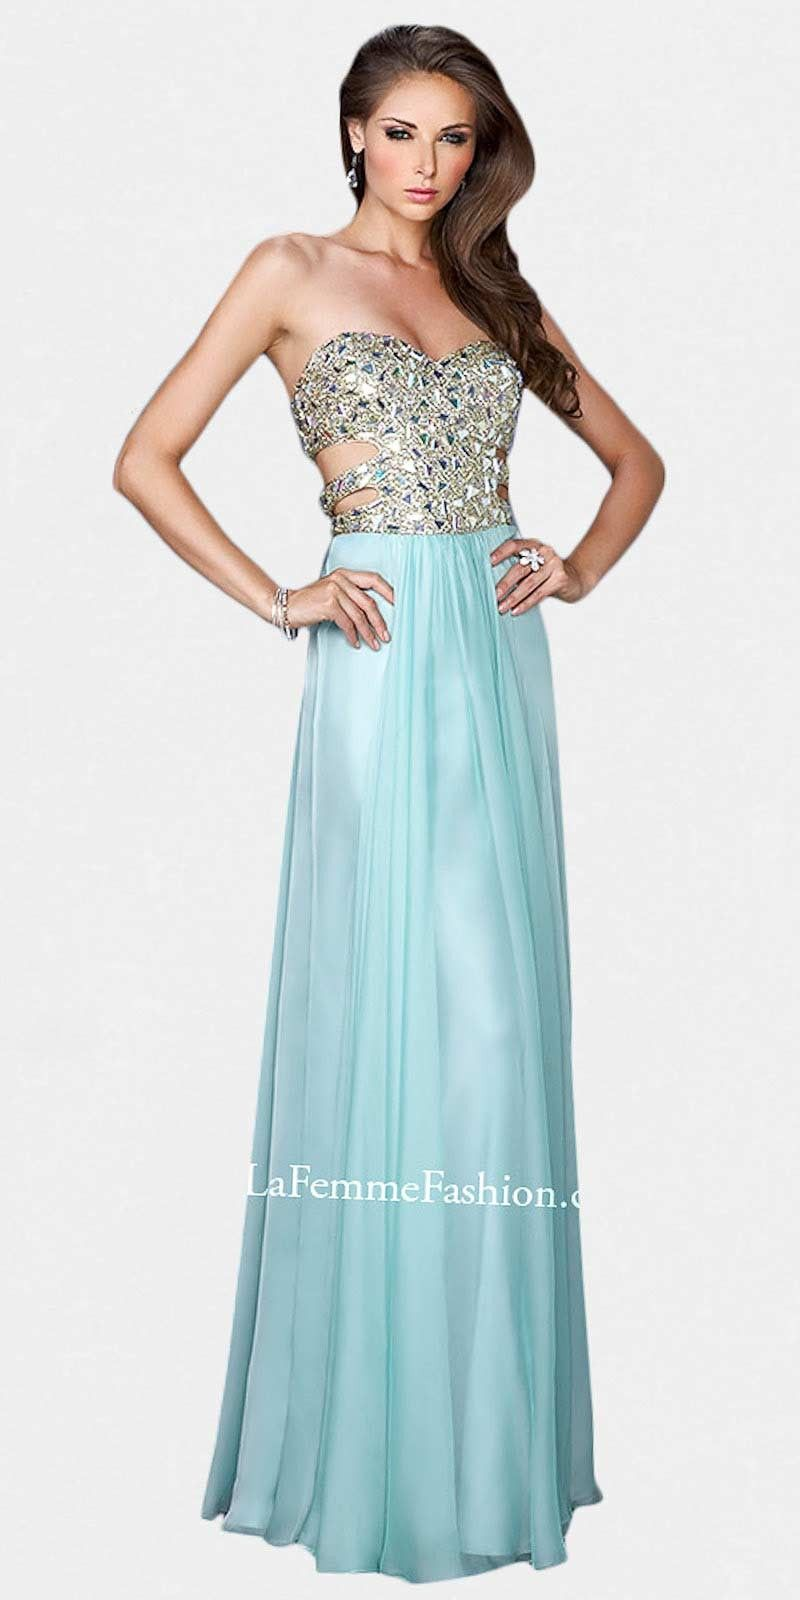 STRAPLESS DIAMOND RHINESTONE CUTOUT PROM DRESSES BY LA FEMME | Prom ...